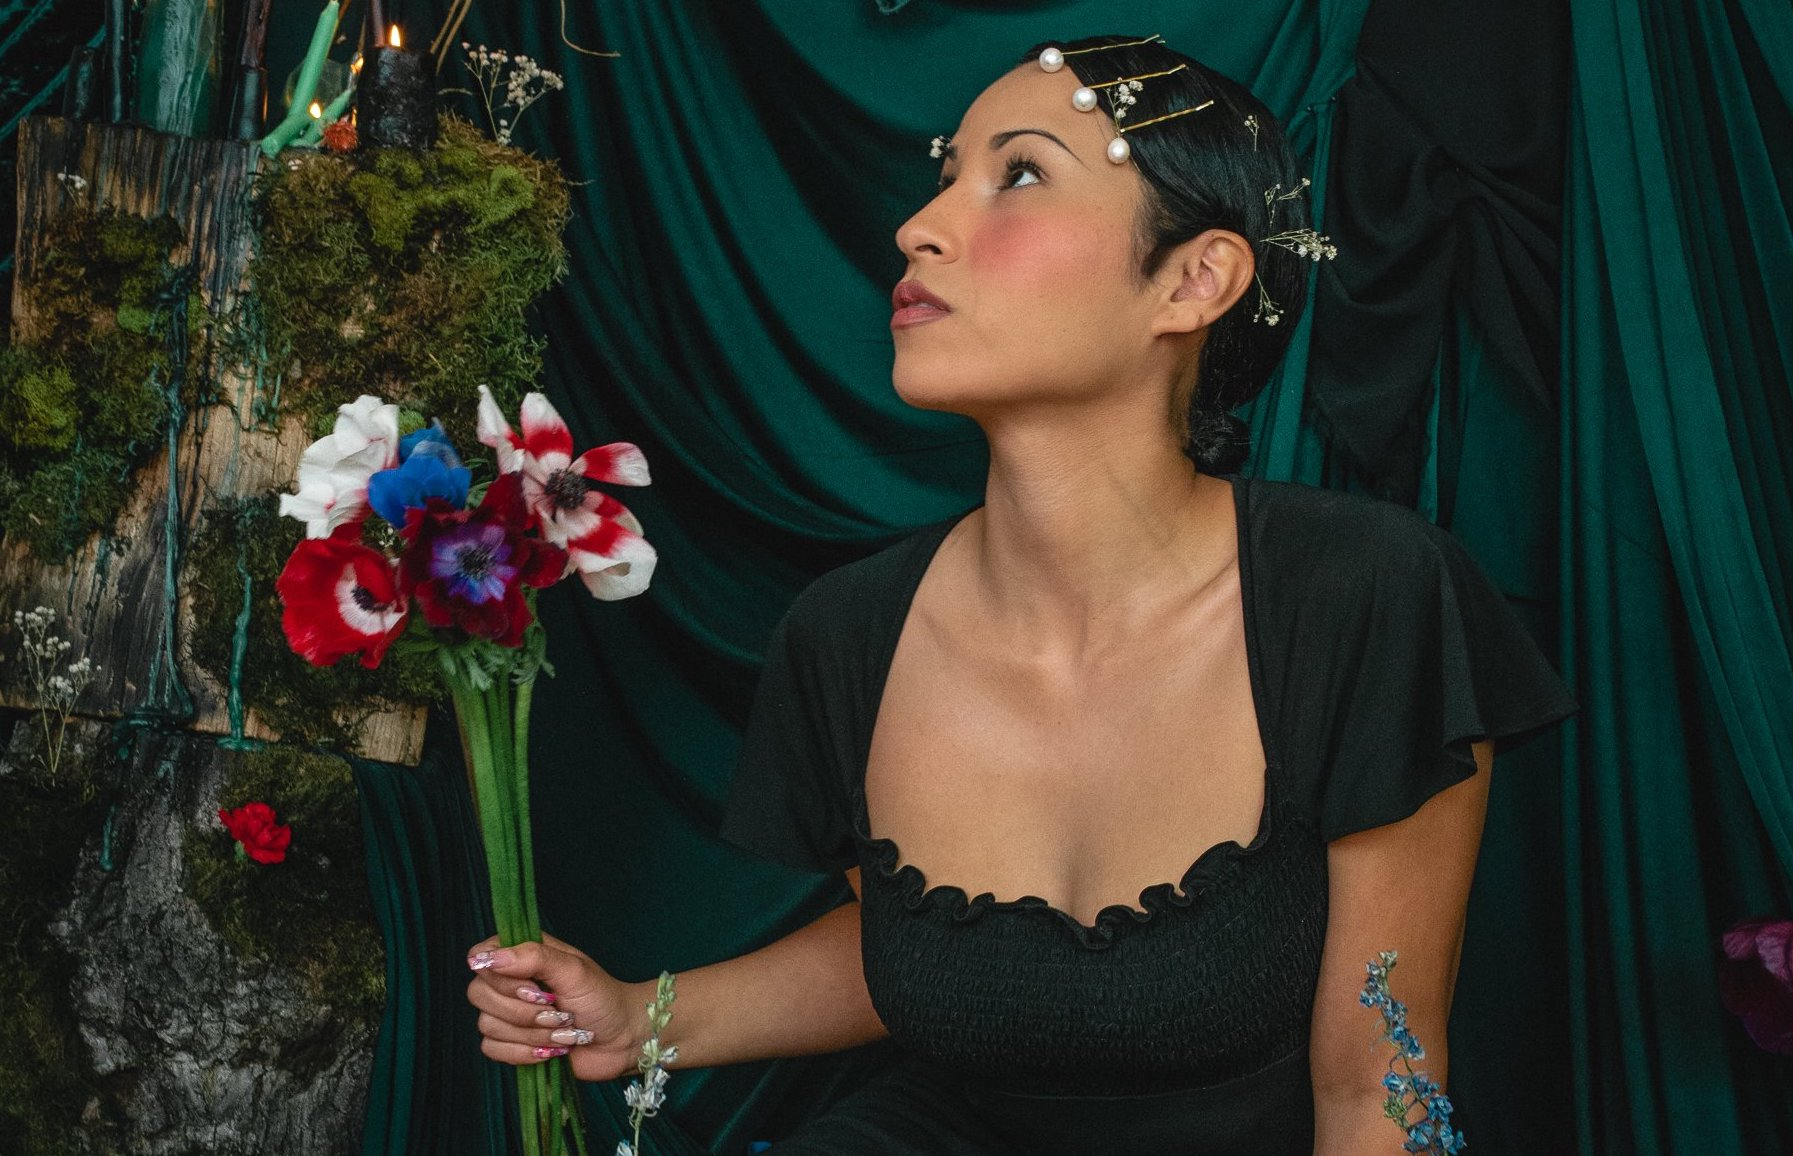 Latina-Owned Brujita Skincare Drops New Line 'House of Brujita' Celebrating the Misfits